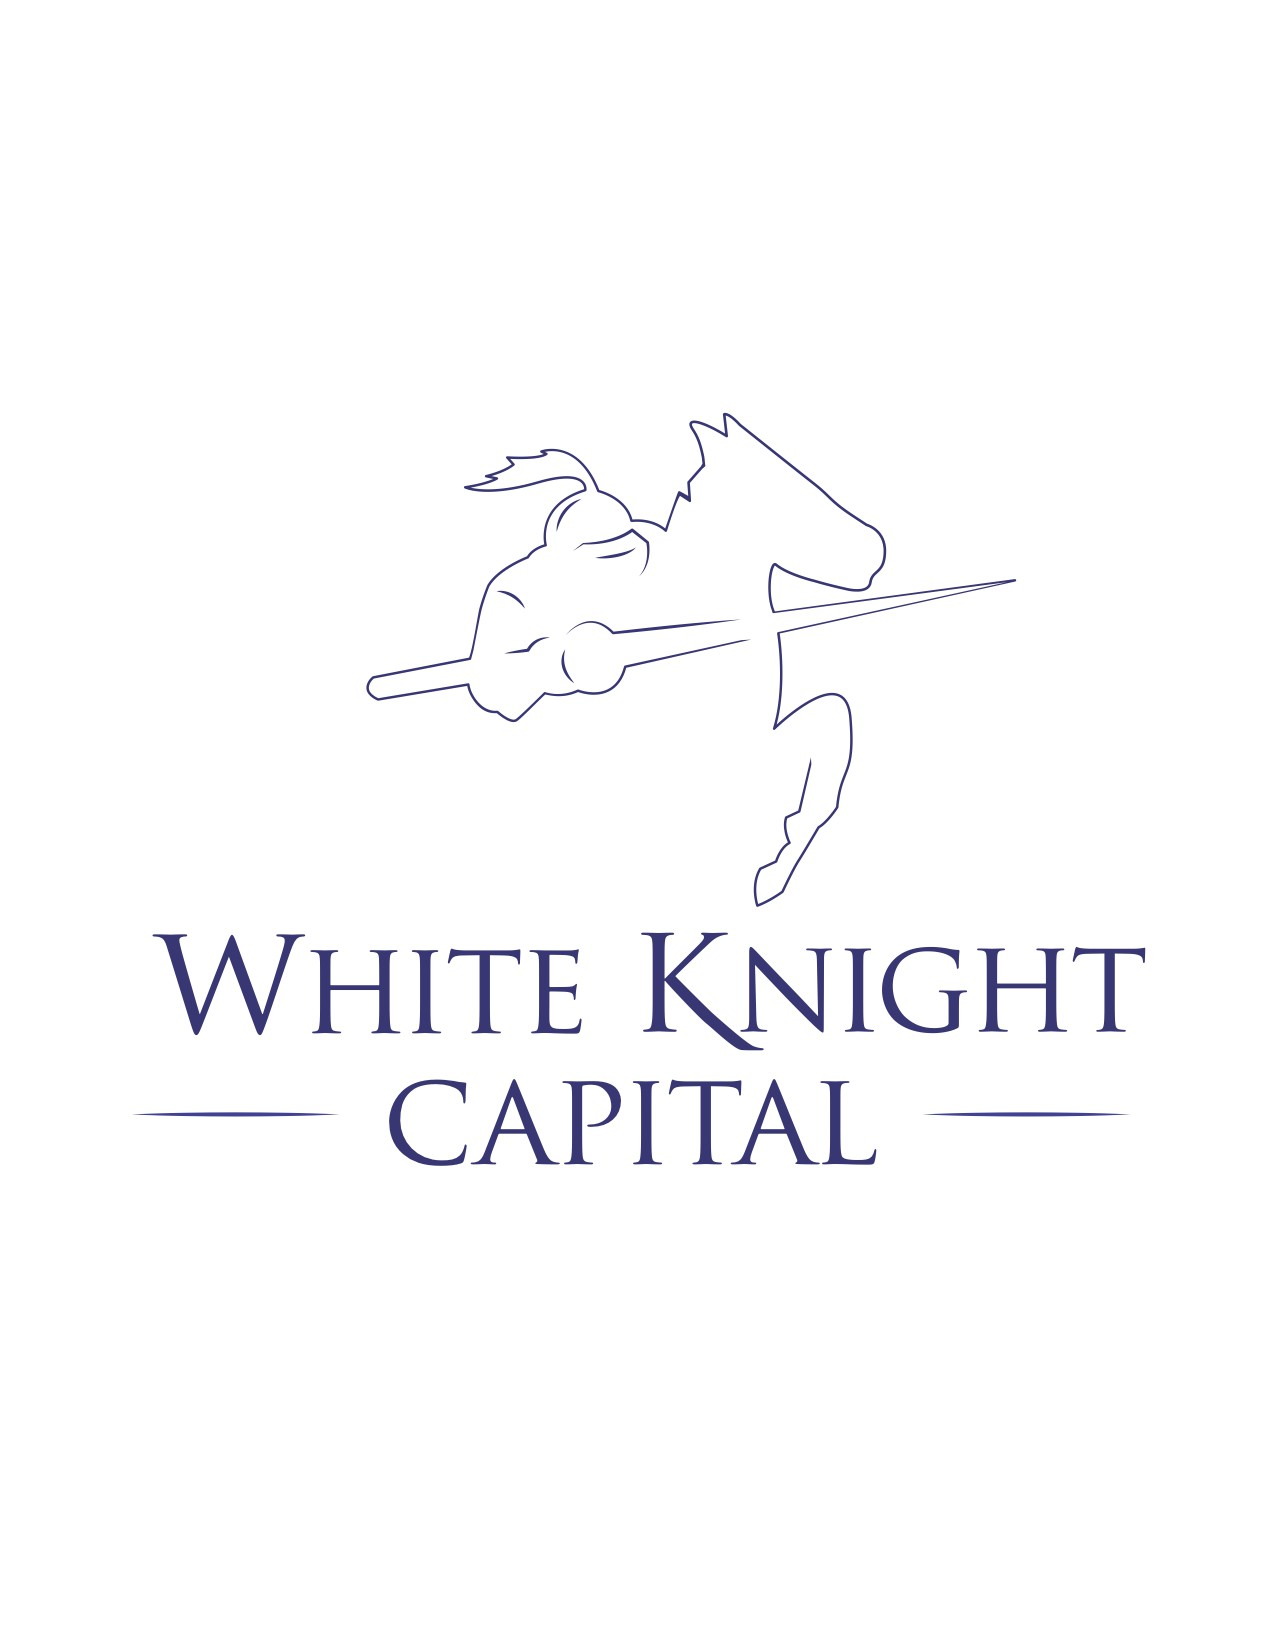 White Knight Capital needs a new logo